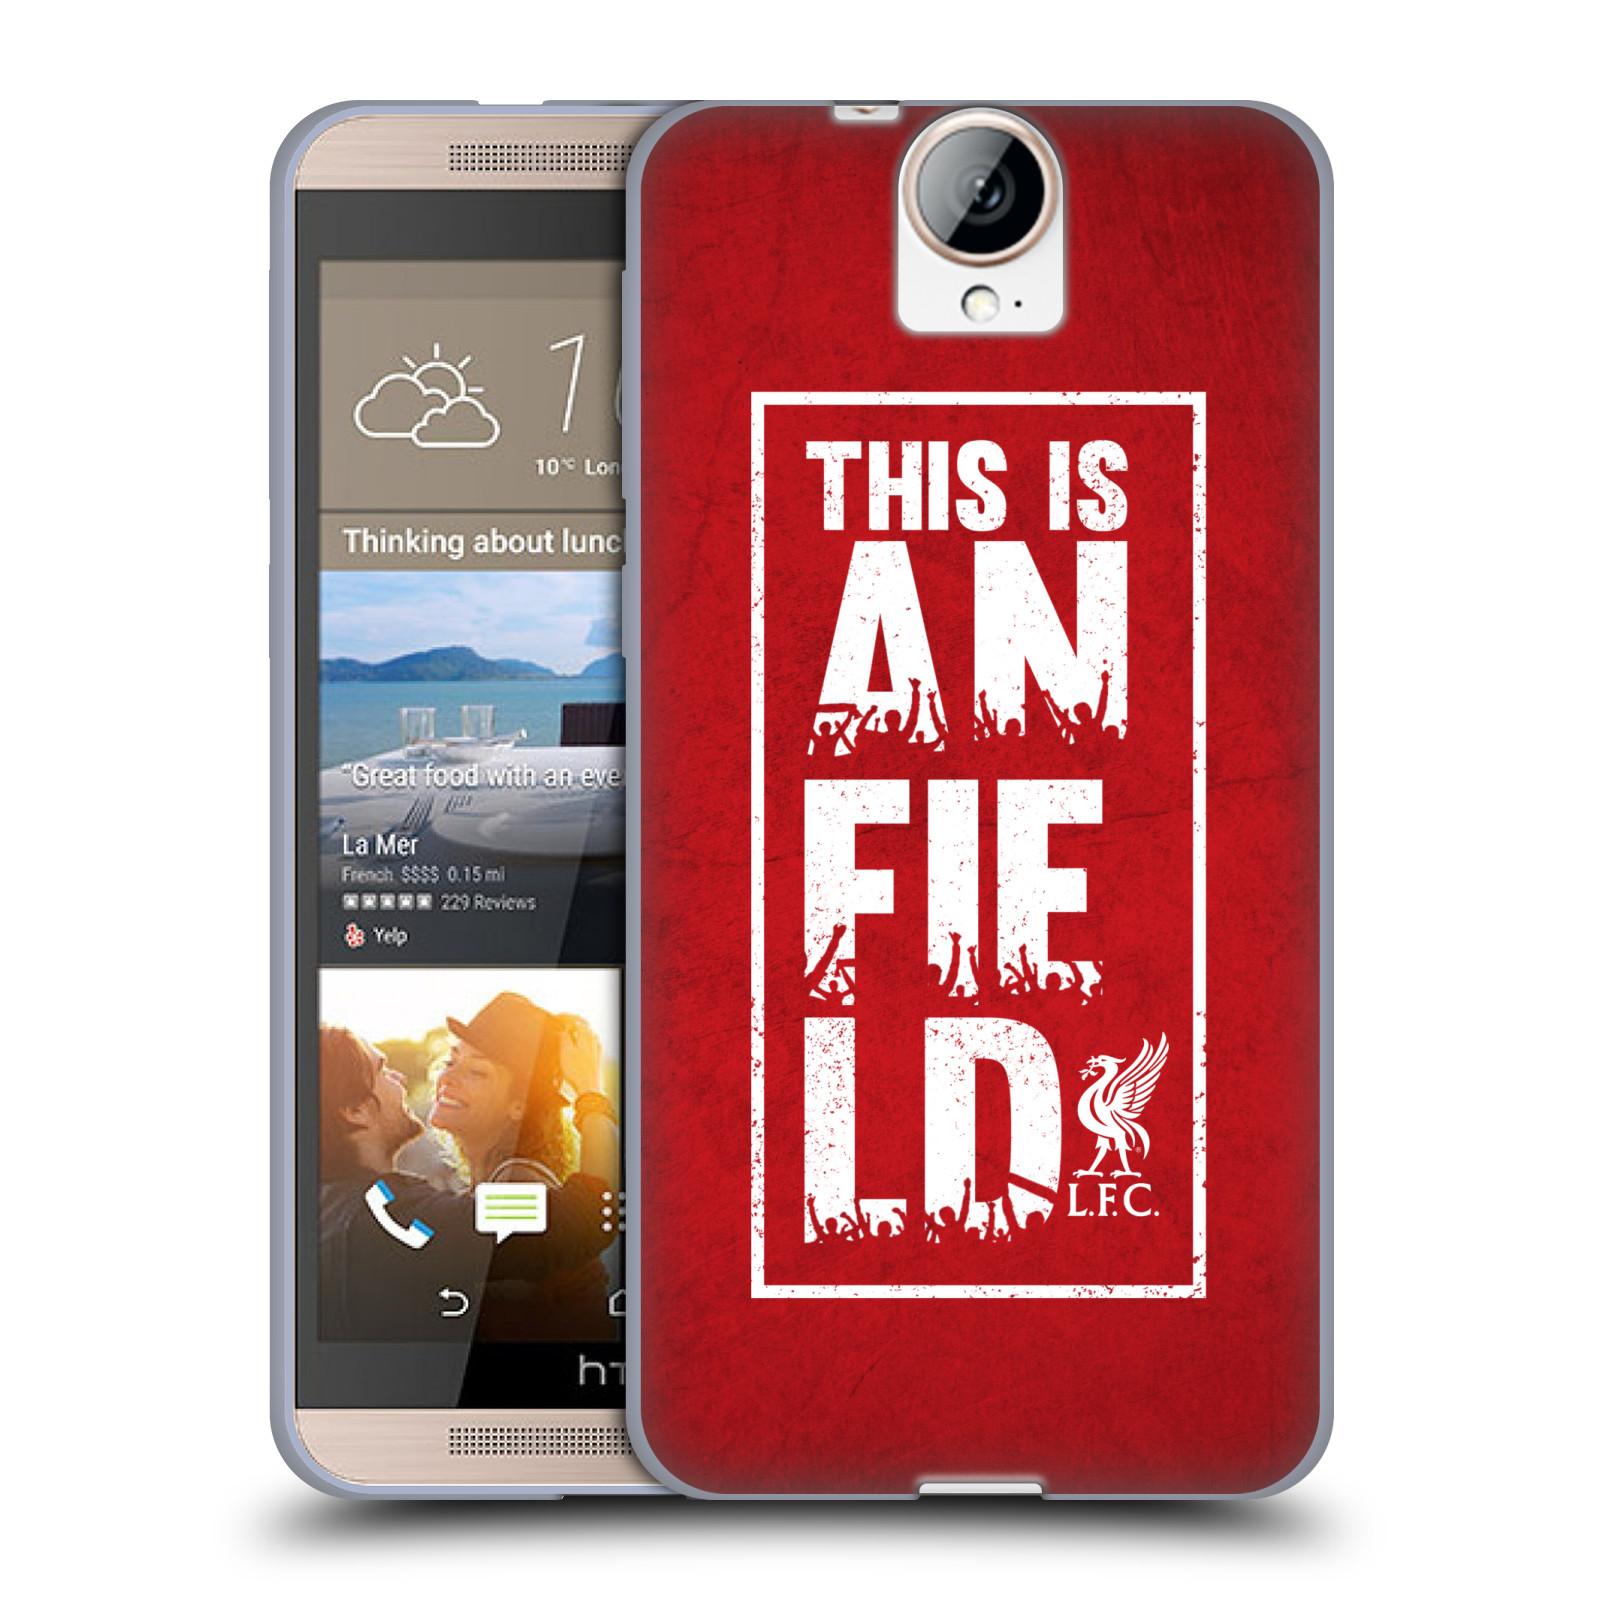 Silikonové pouzdro na mobil HTC One E9+(Plus) HEAD CASE Liverpool FC This Is Anfield Red (Silikonový kryt či obal na mobilní telefon Liverpool FC Official pro HTC One E9+)